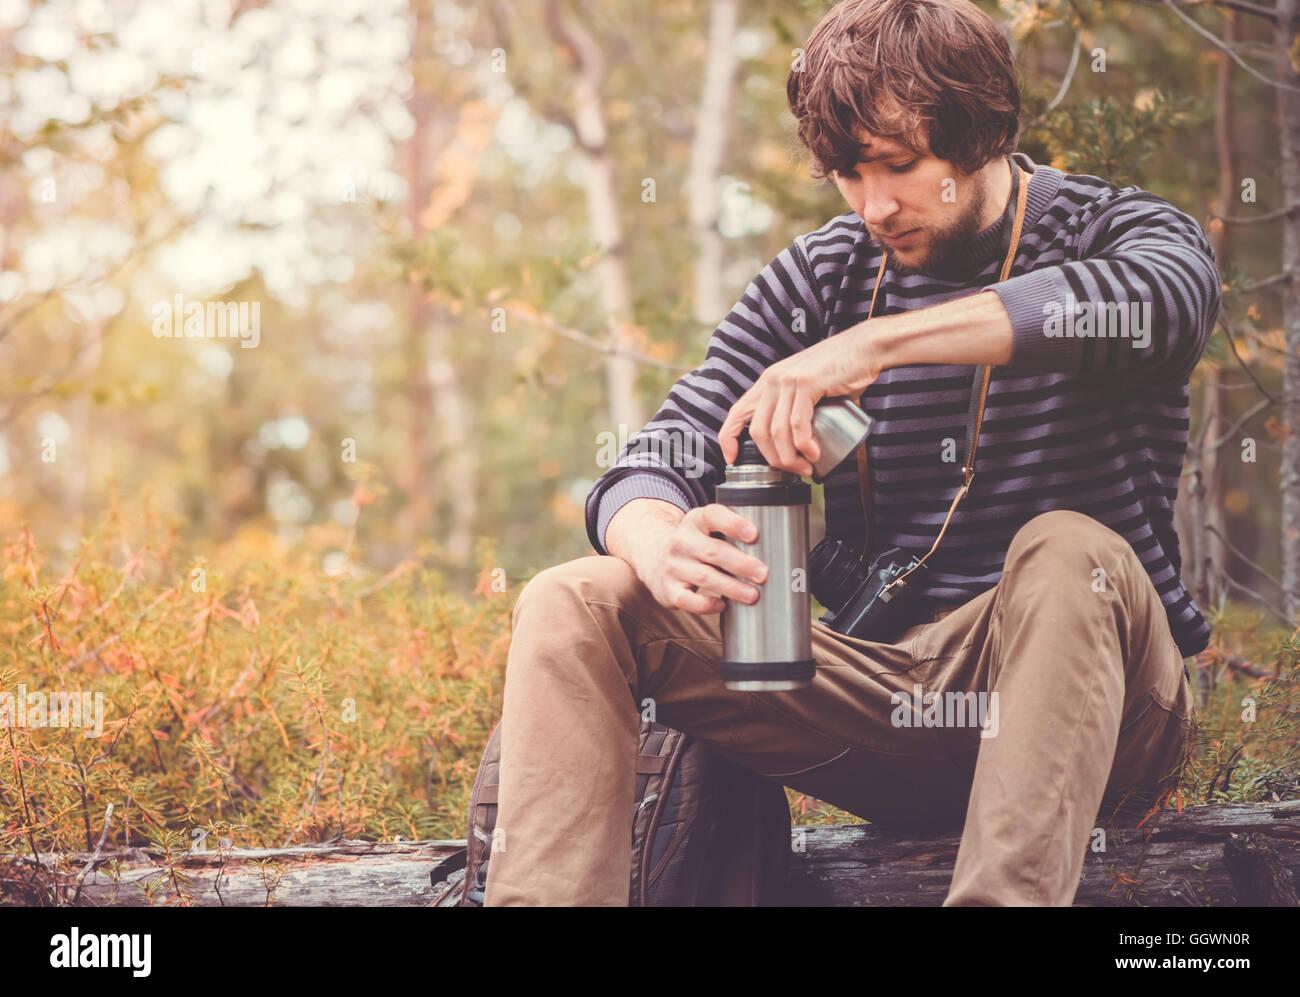 Traveler Man relaxing in forest avec thermos, sac à dos et appareil photo de vie voyage vacances concept outdoor Photo Stock